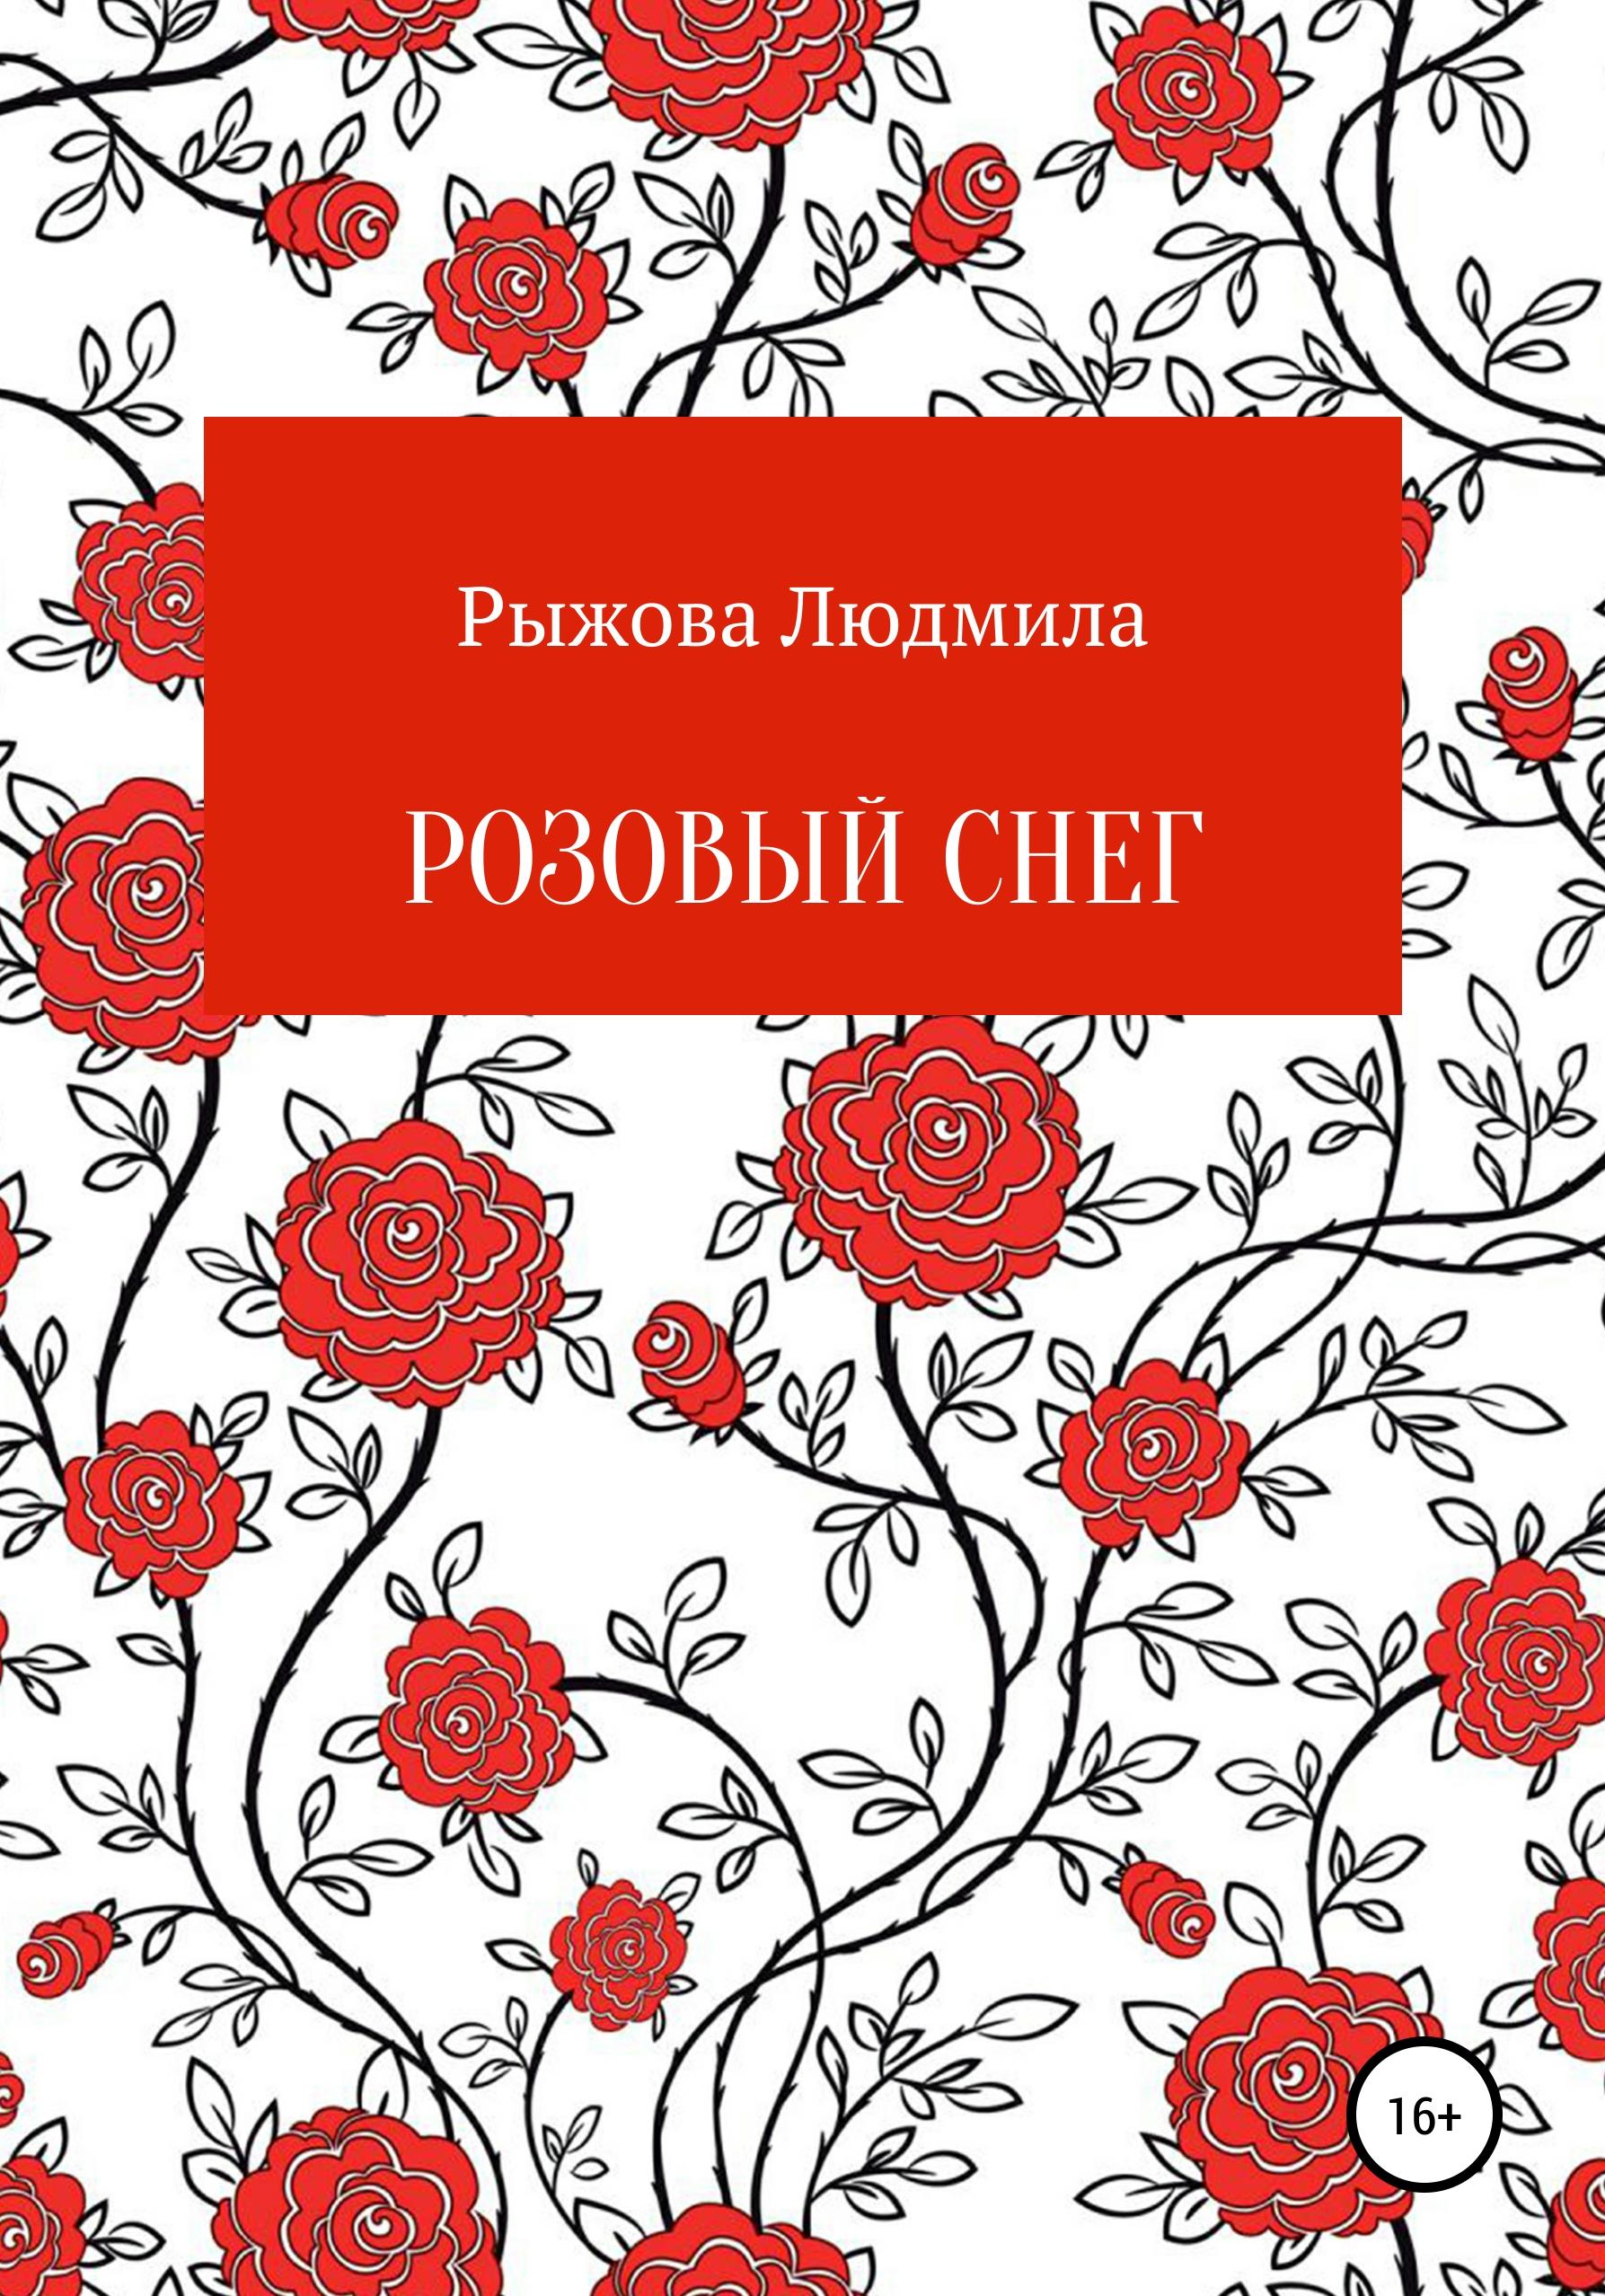 Людмила Рыжова Розовый снег рюкзак bange bg1907 серый 15 6